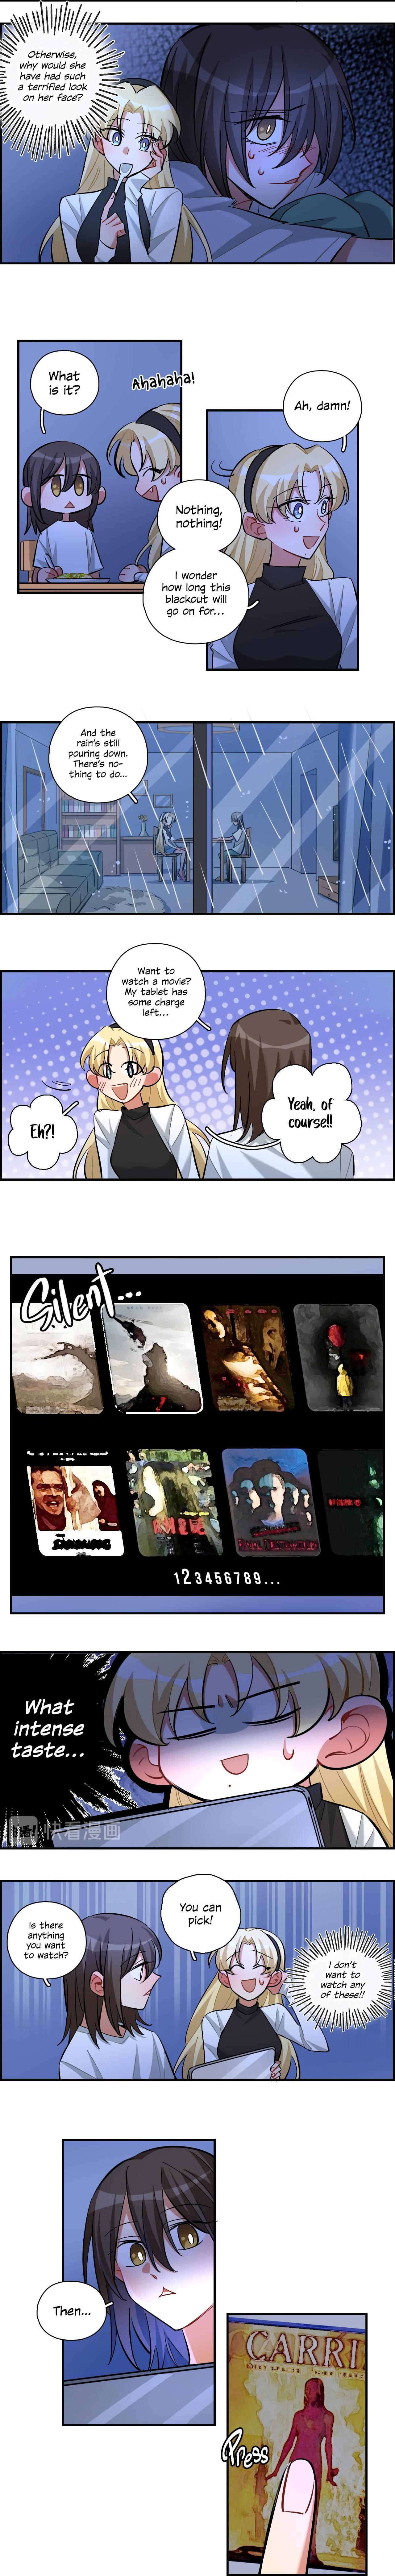 Almost Friends Chapter 21 page 4 - Mangakakalots.com